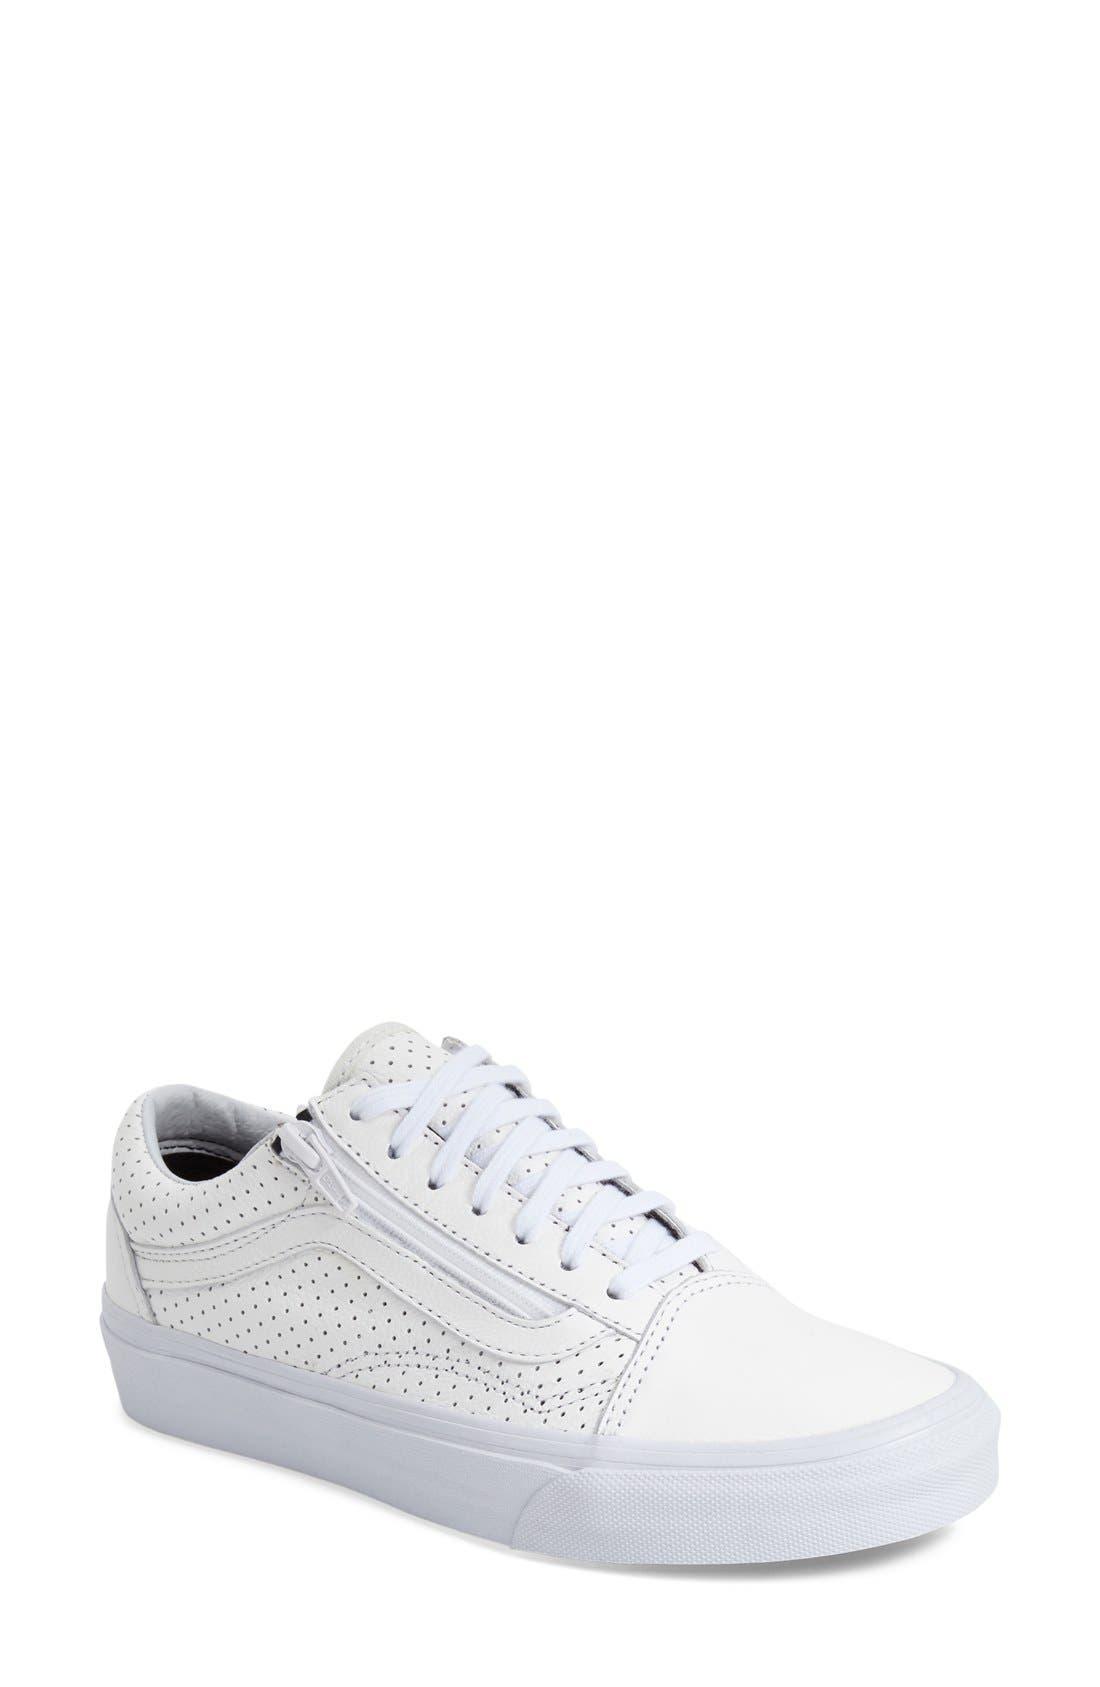 Main Image - Vans 'Old Skool' Zip Sneaker (Women)